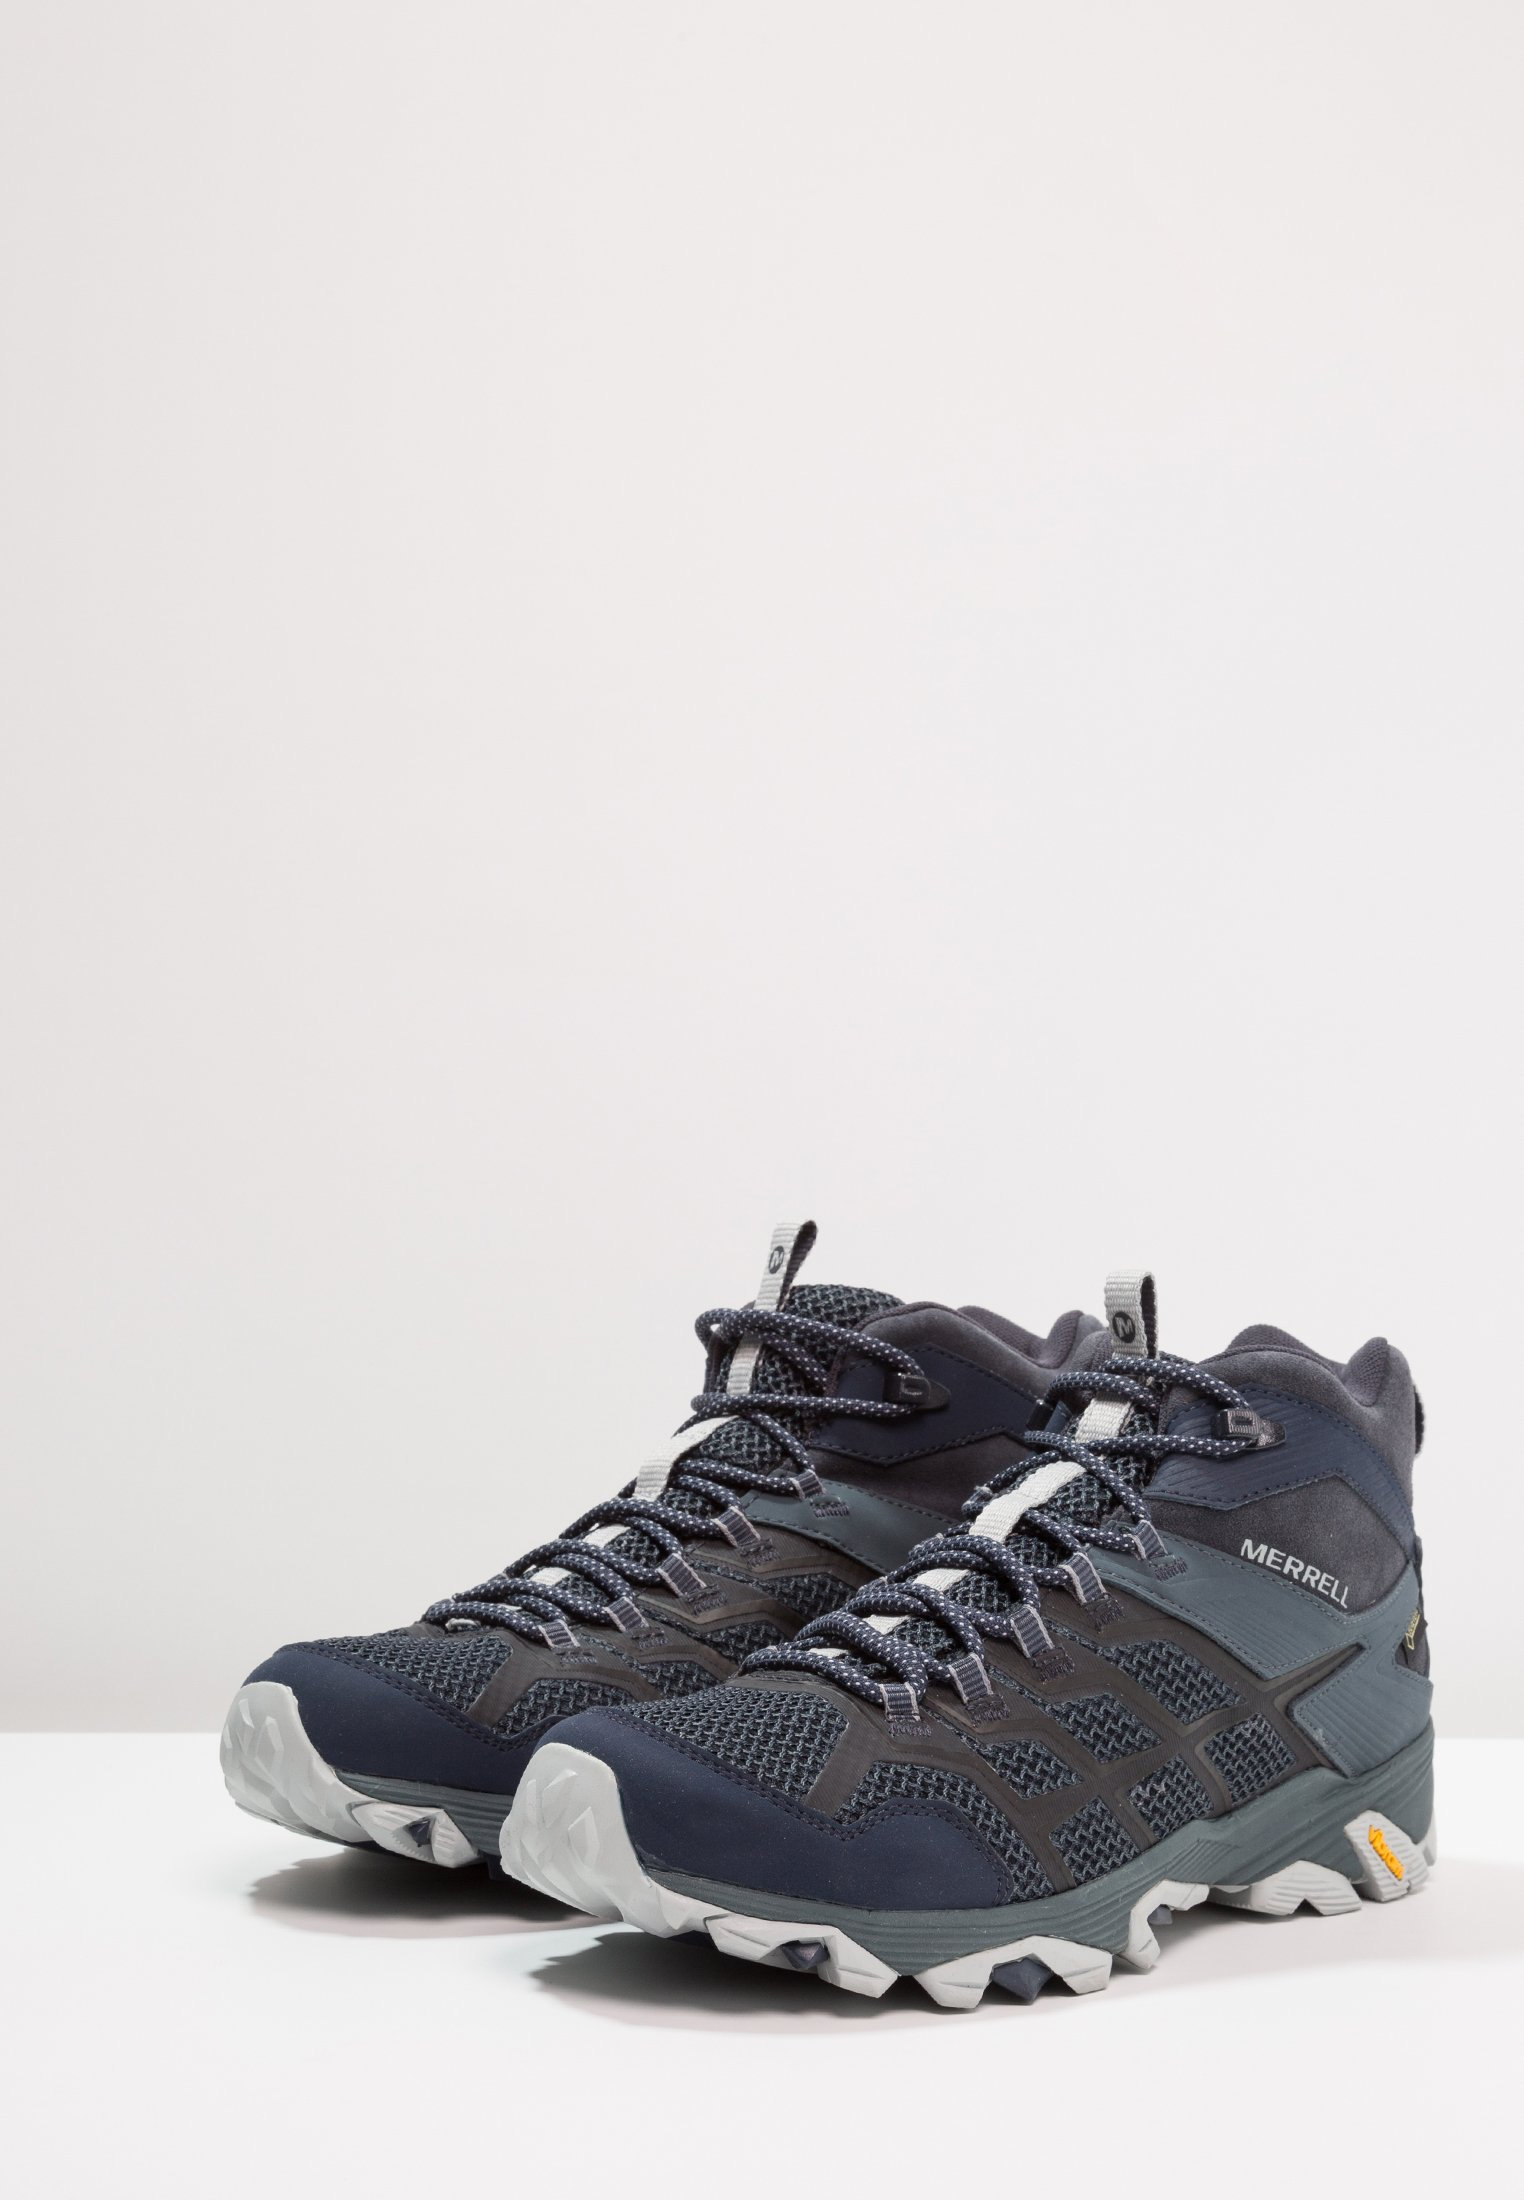 Merrell MOAB 2 MID GTX - Chaussures de marche navy/slate